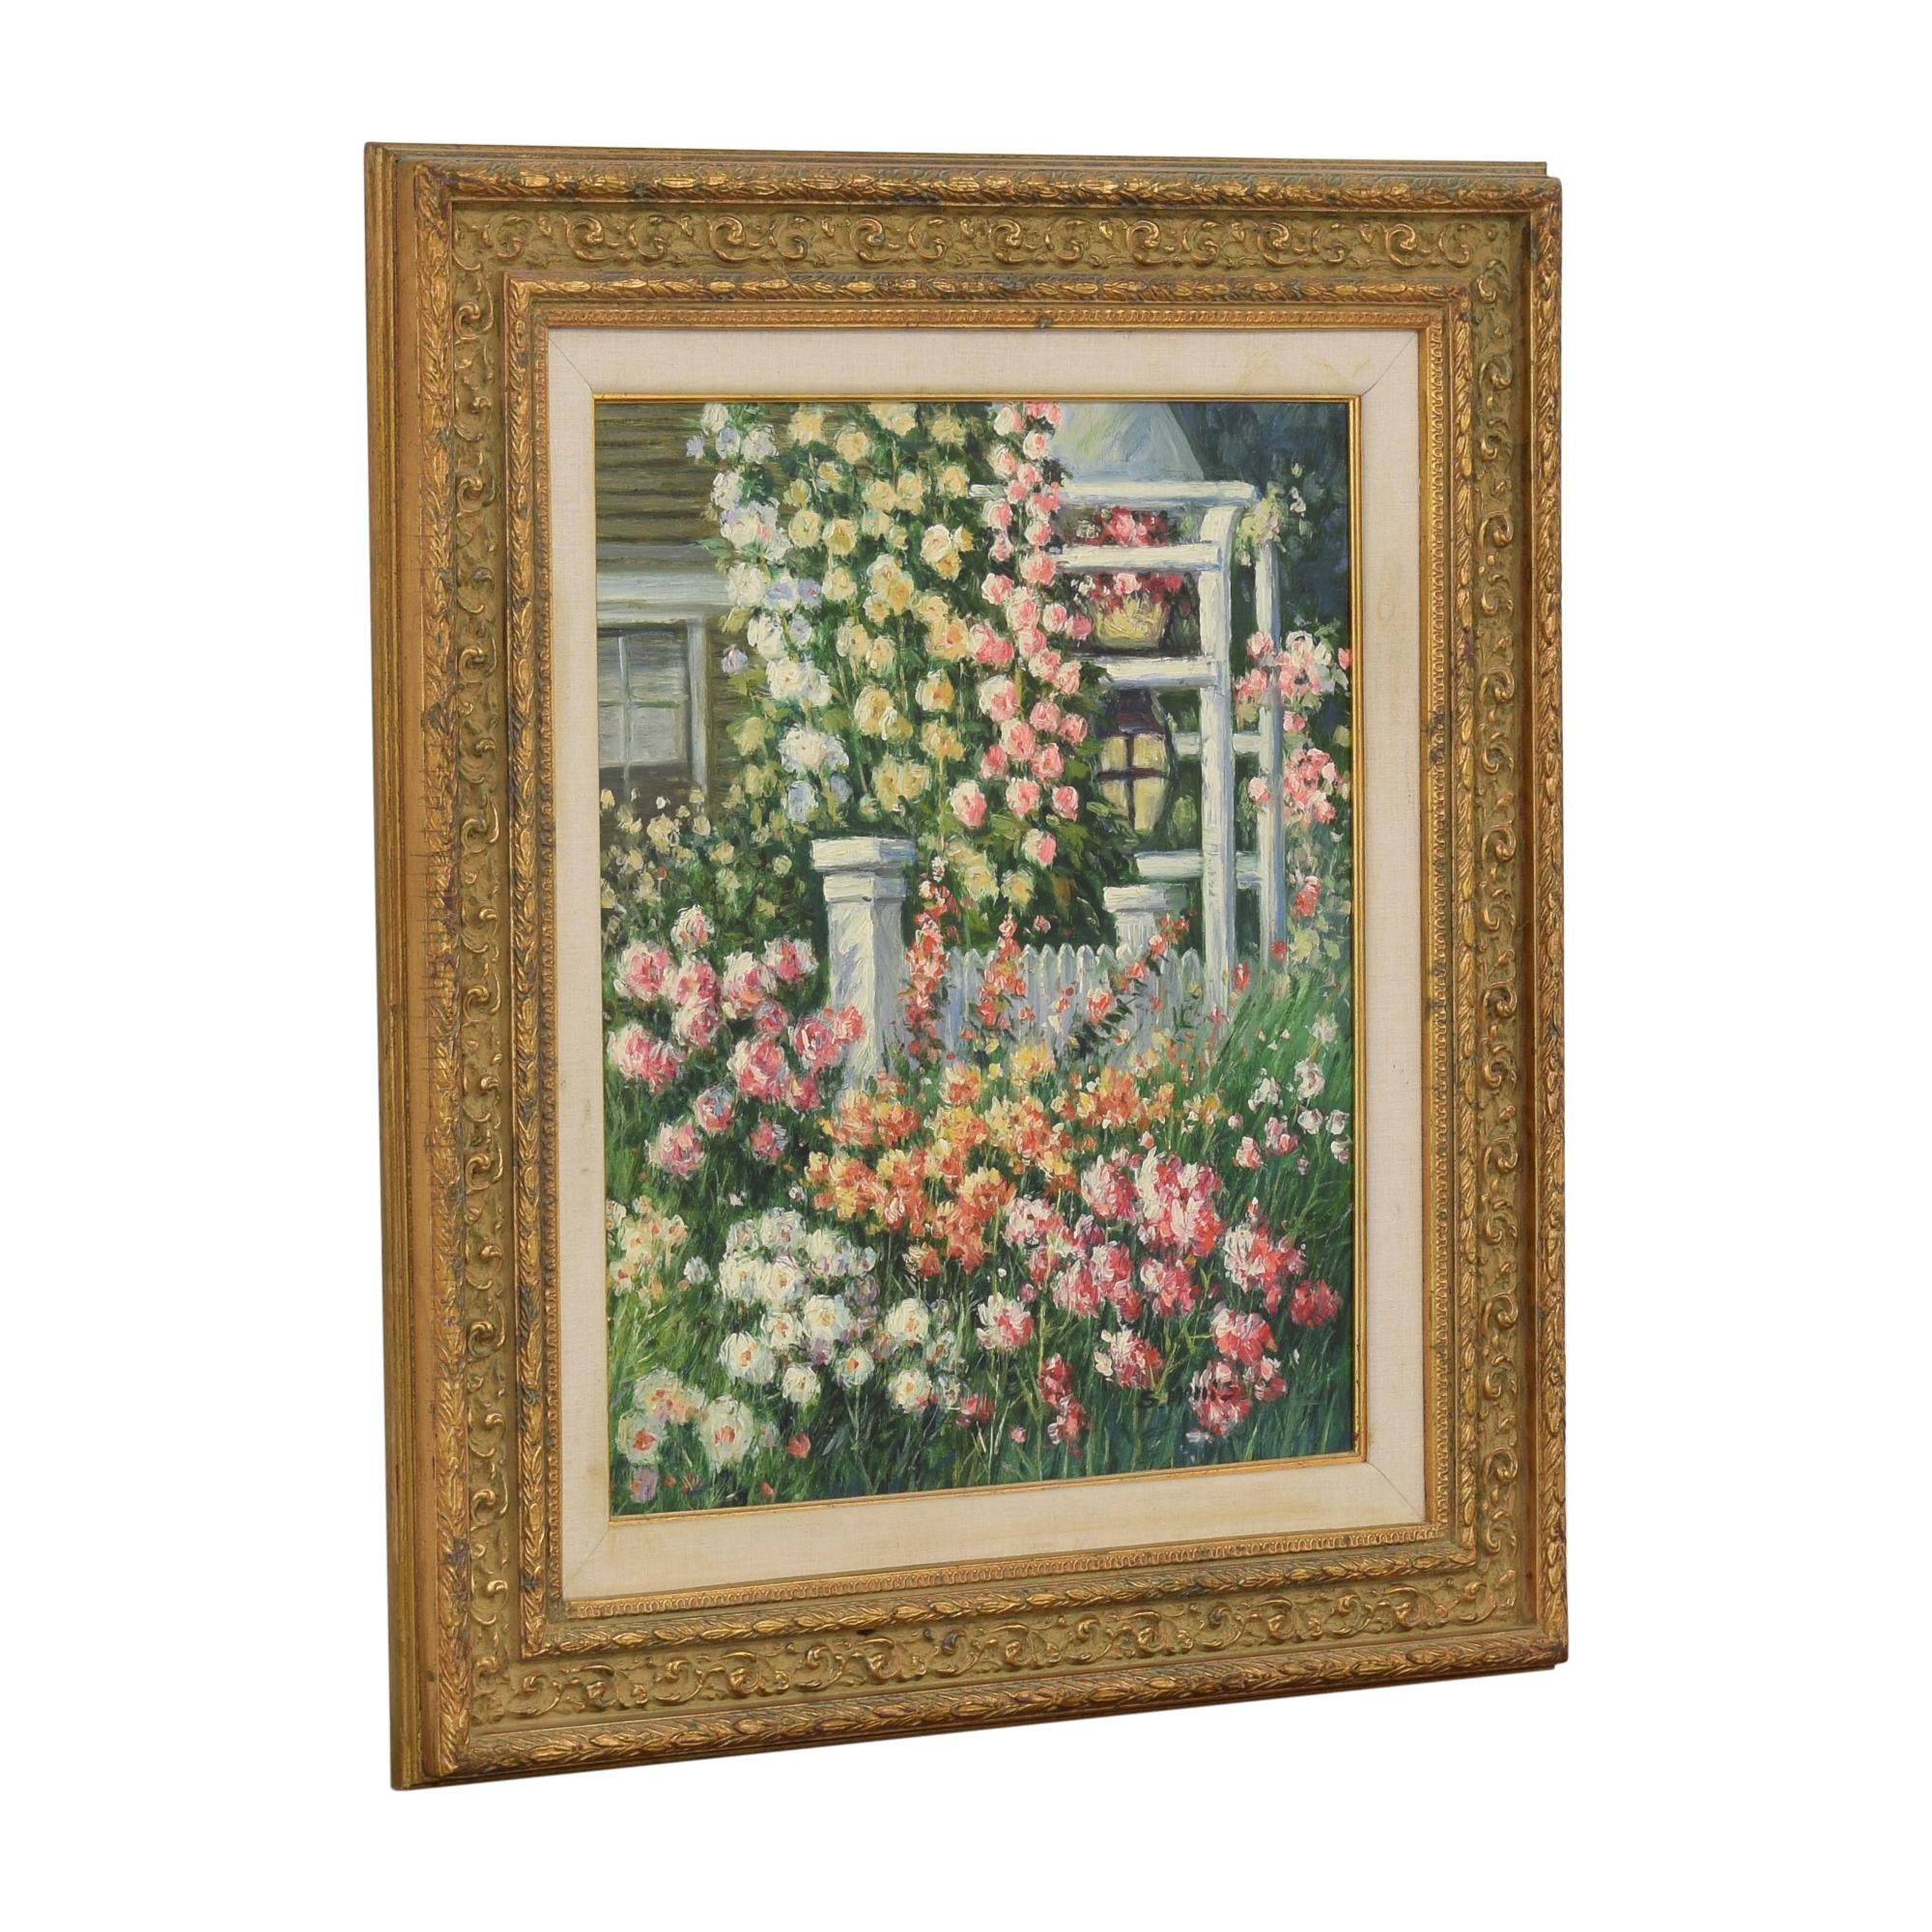 Framed Floral Wall Art on sale